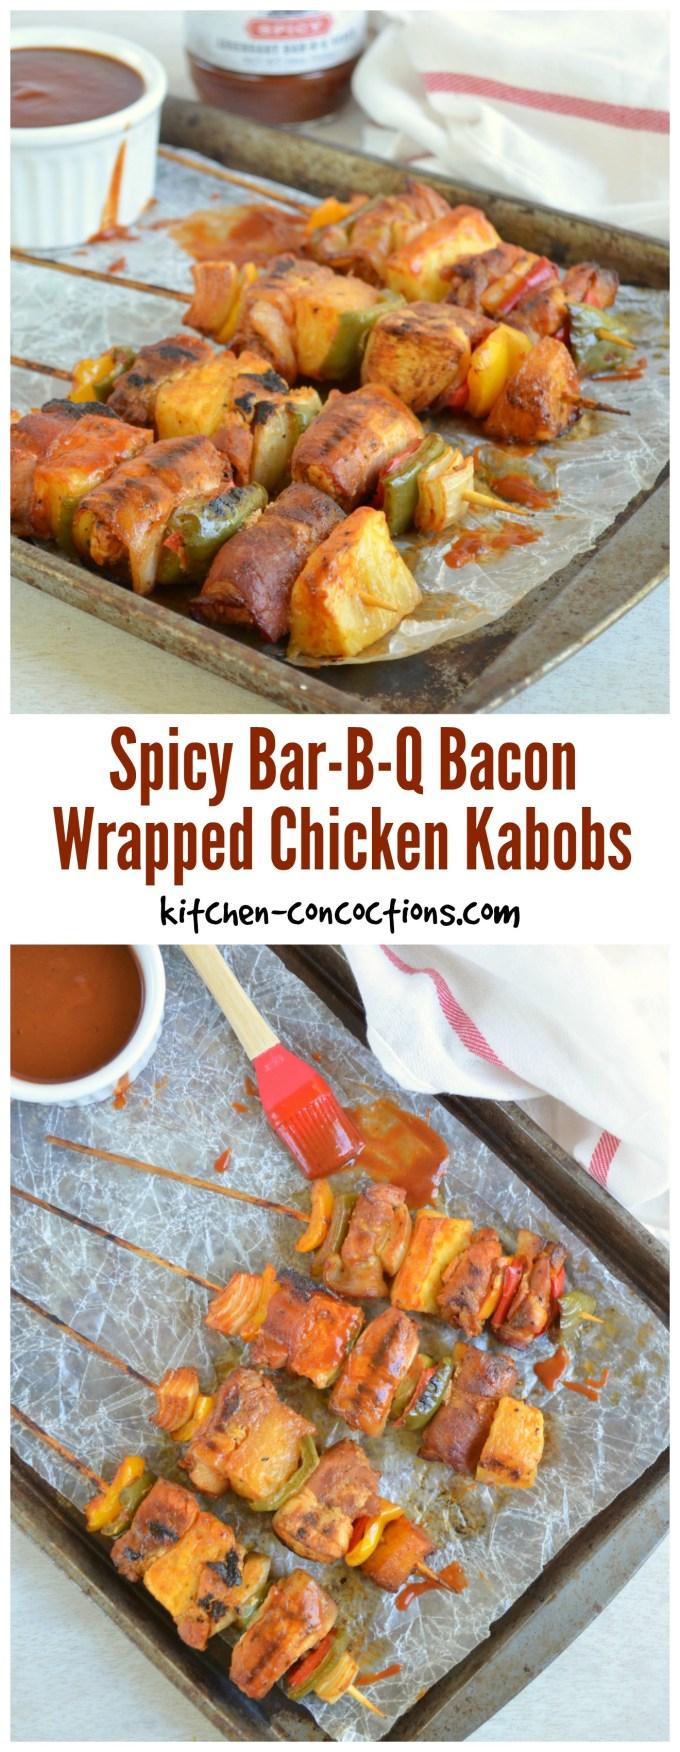 Spicy Bar-B-Q Bacon Wrapped Chicken Kabob Recipe